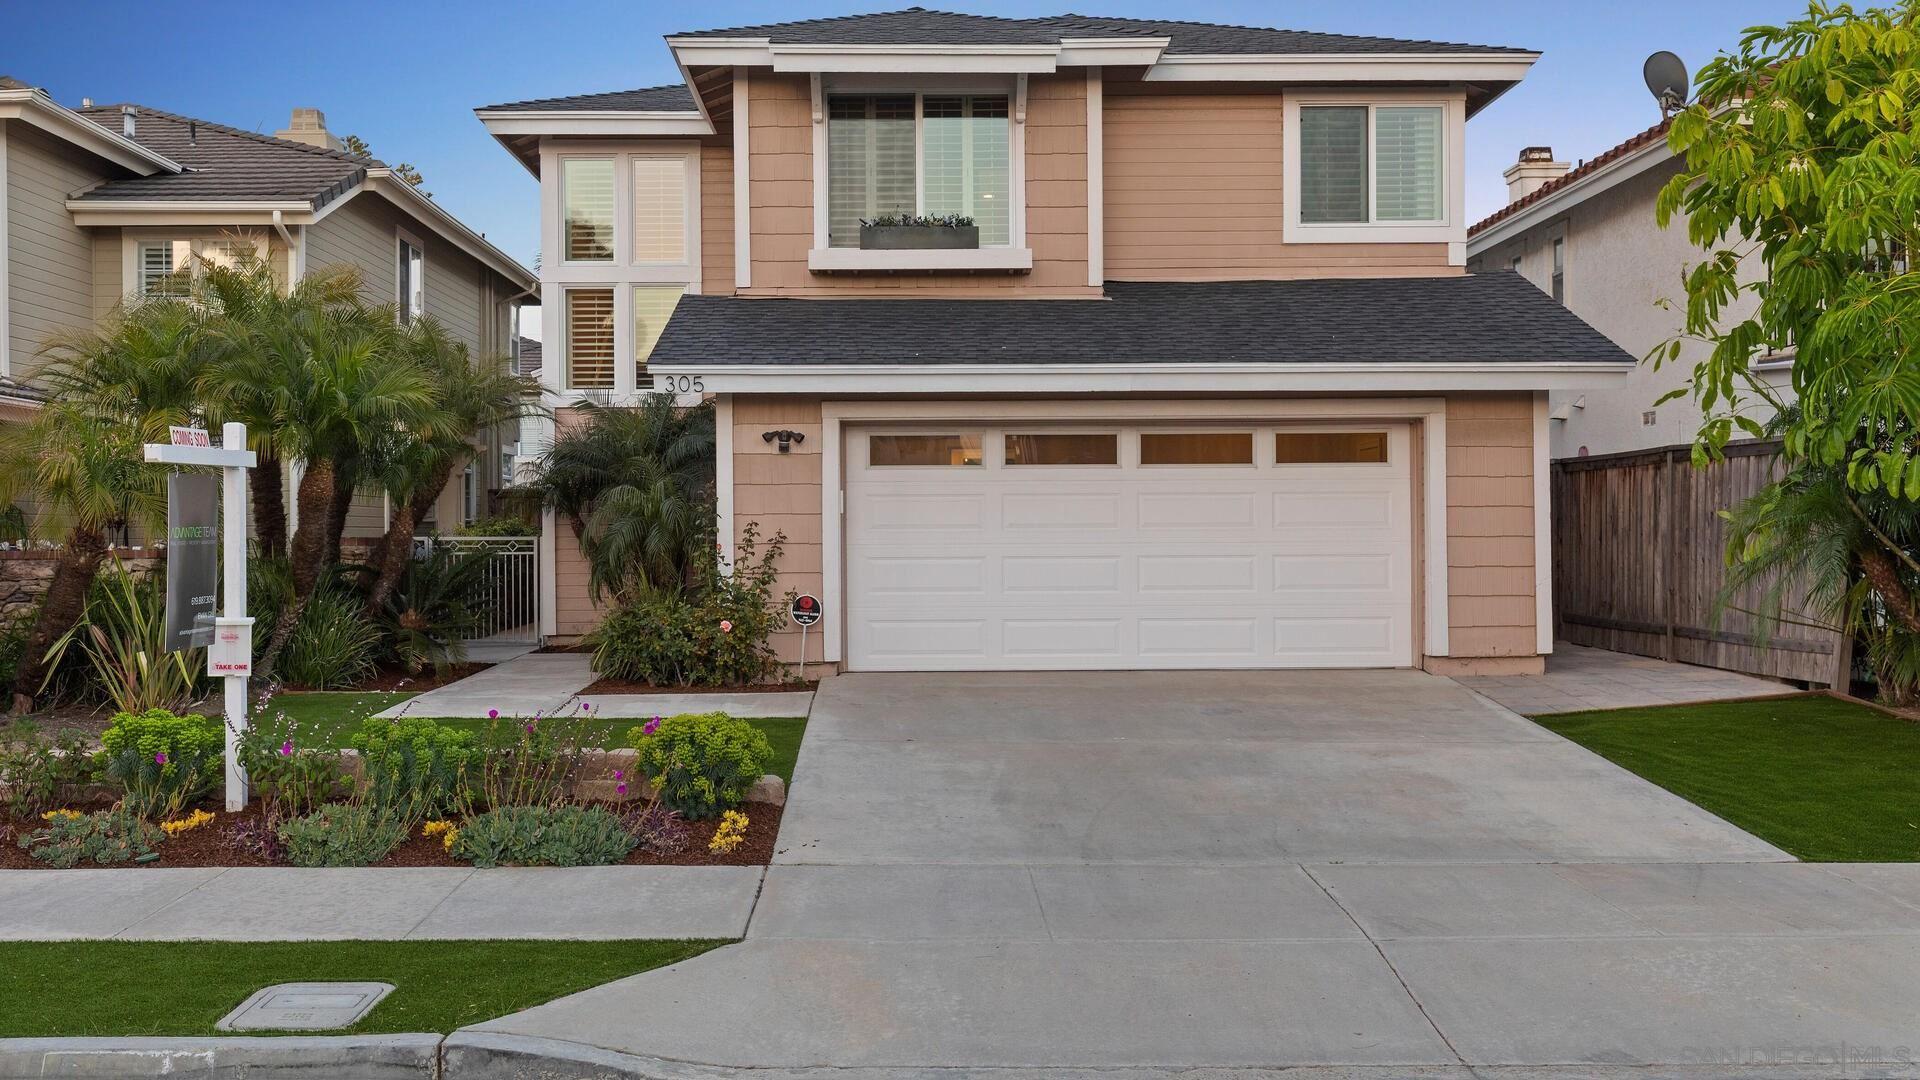 Photo of 305 La Veta Ave, Encinitas, CA 92024 (MLS # 210008527)